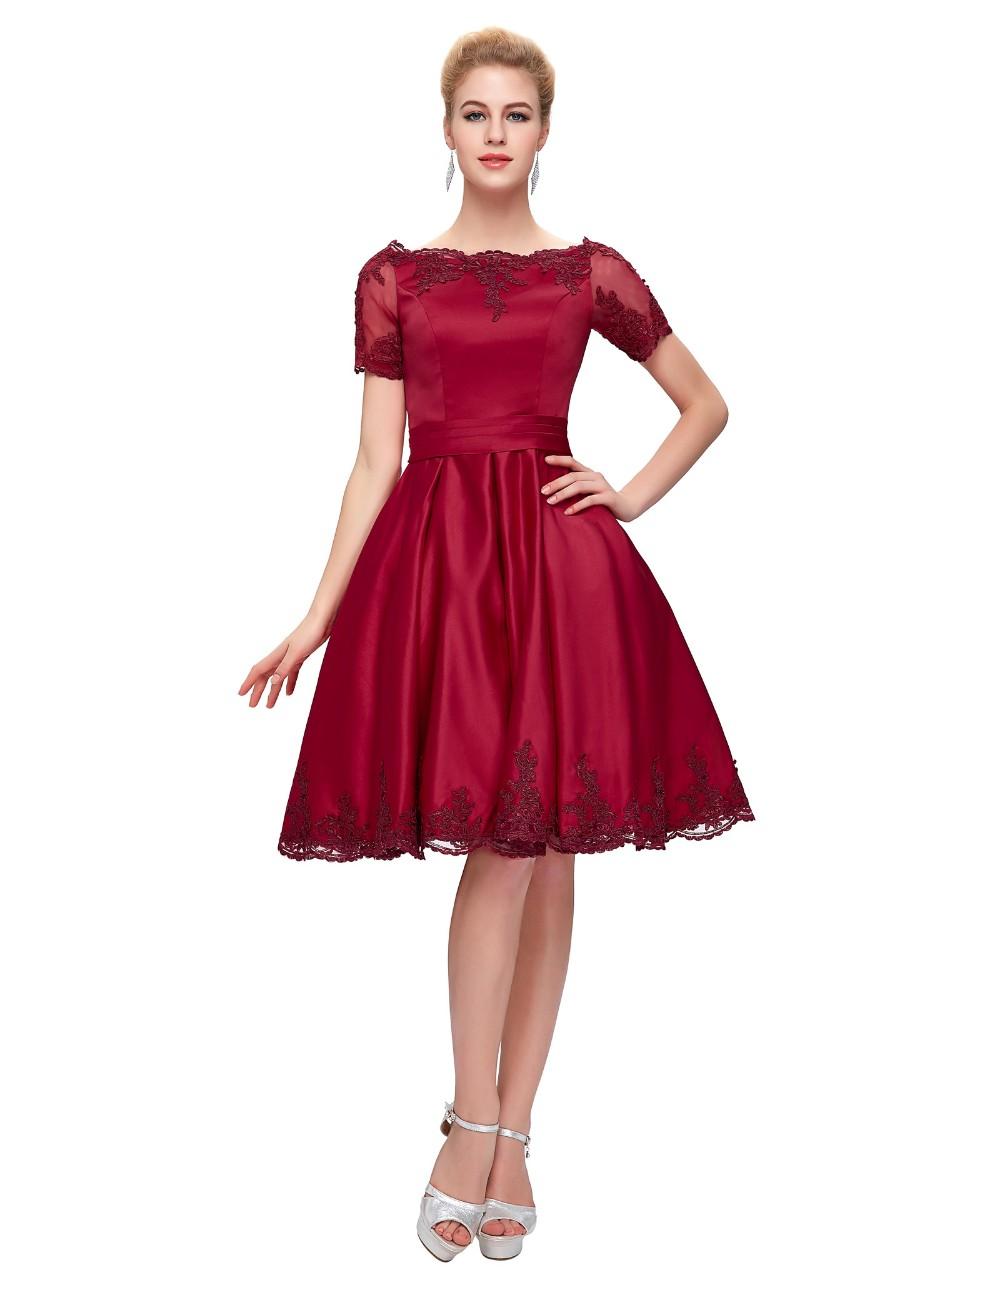 Short Cocktail Dresses 2018 Grace Karin Off The Shoulder robe de Cocktail Wedding Party Dress Satin Champagne Red Coctail Dress 5